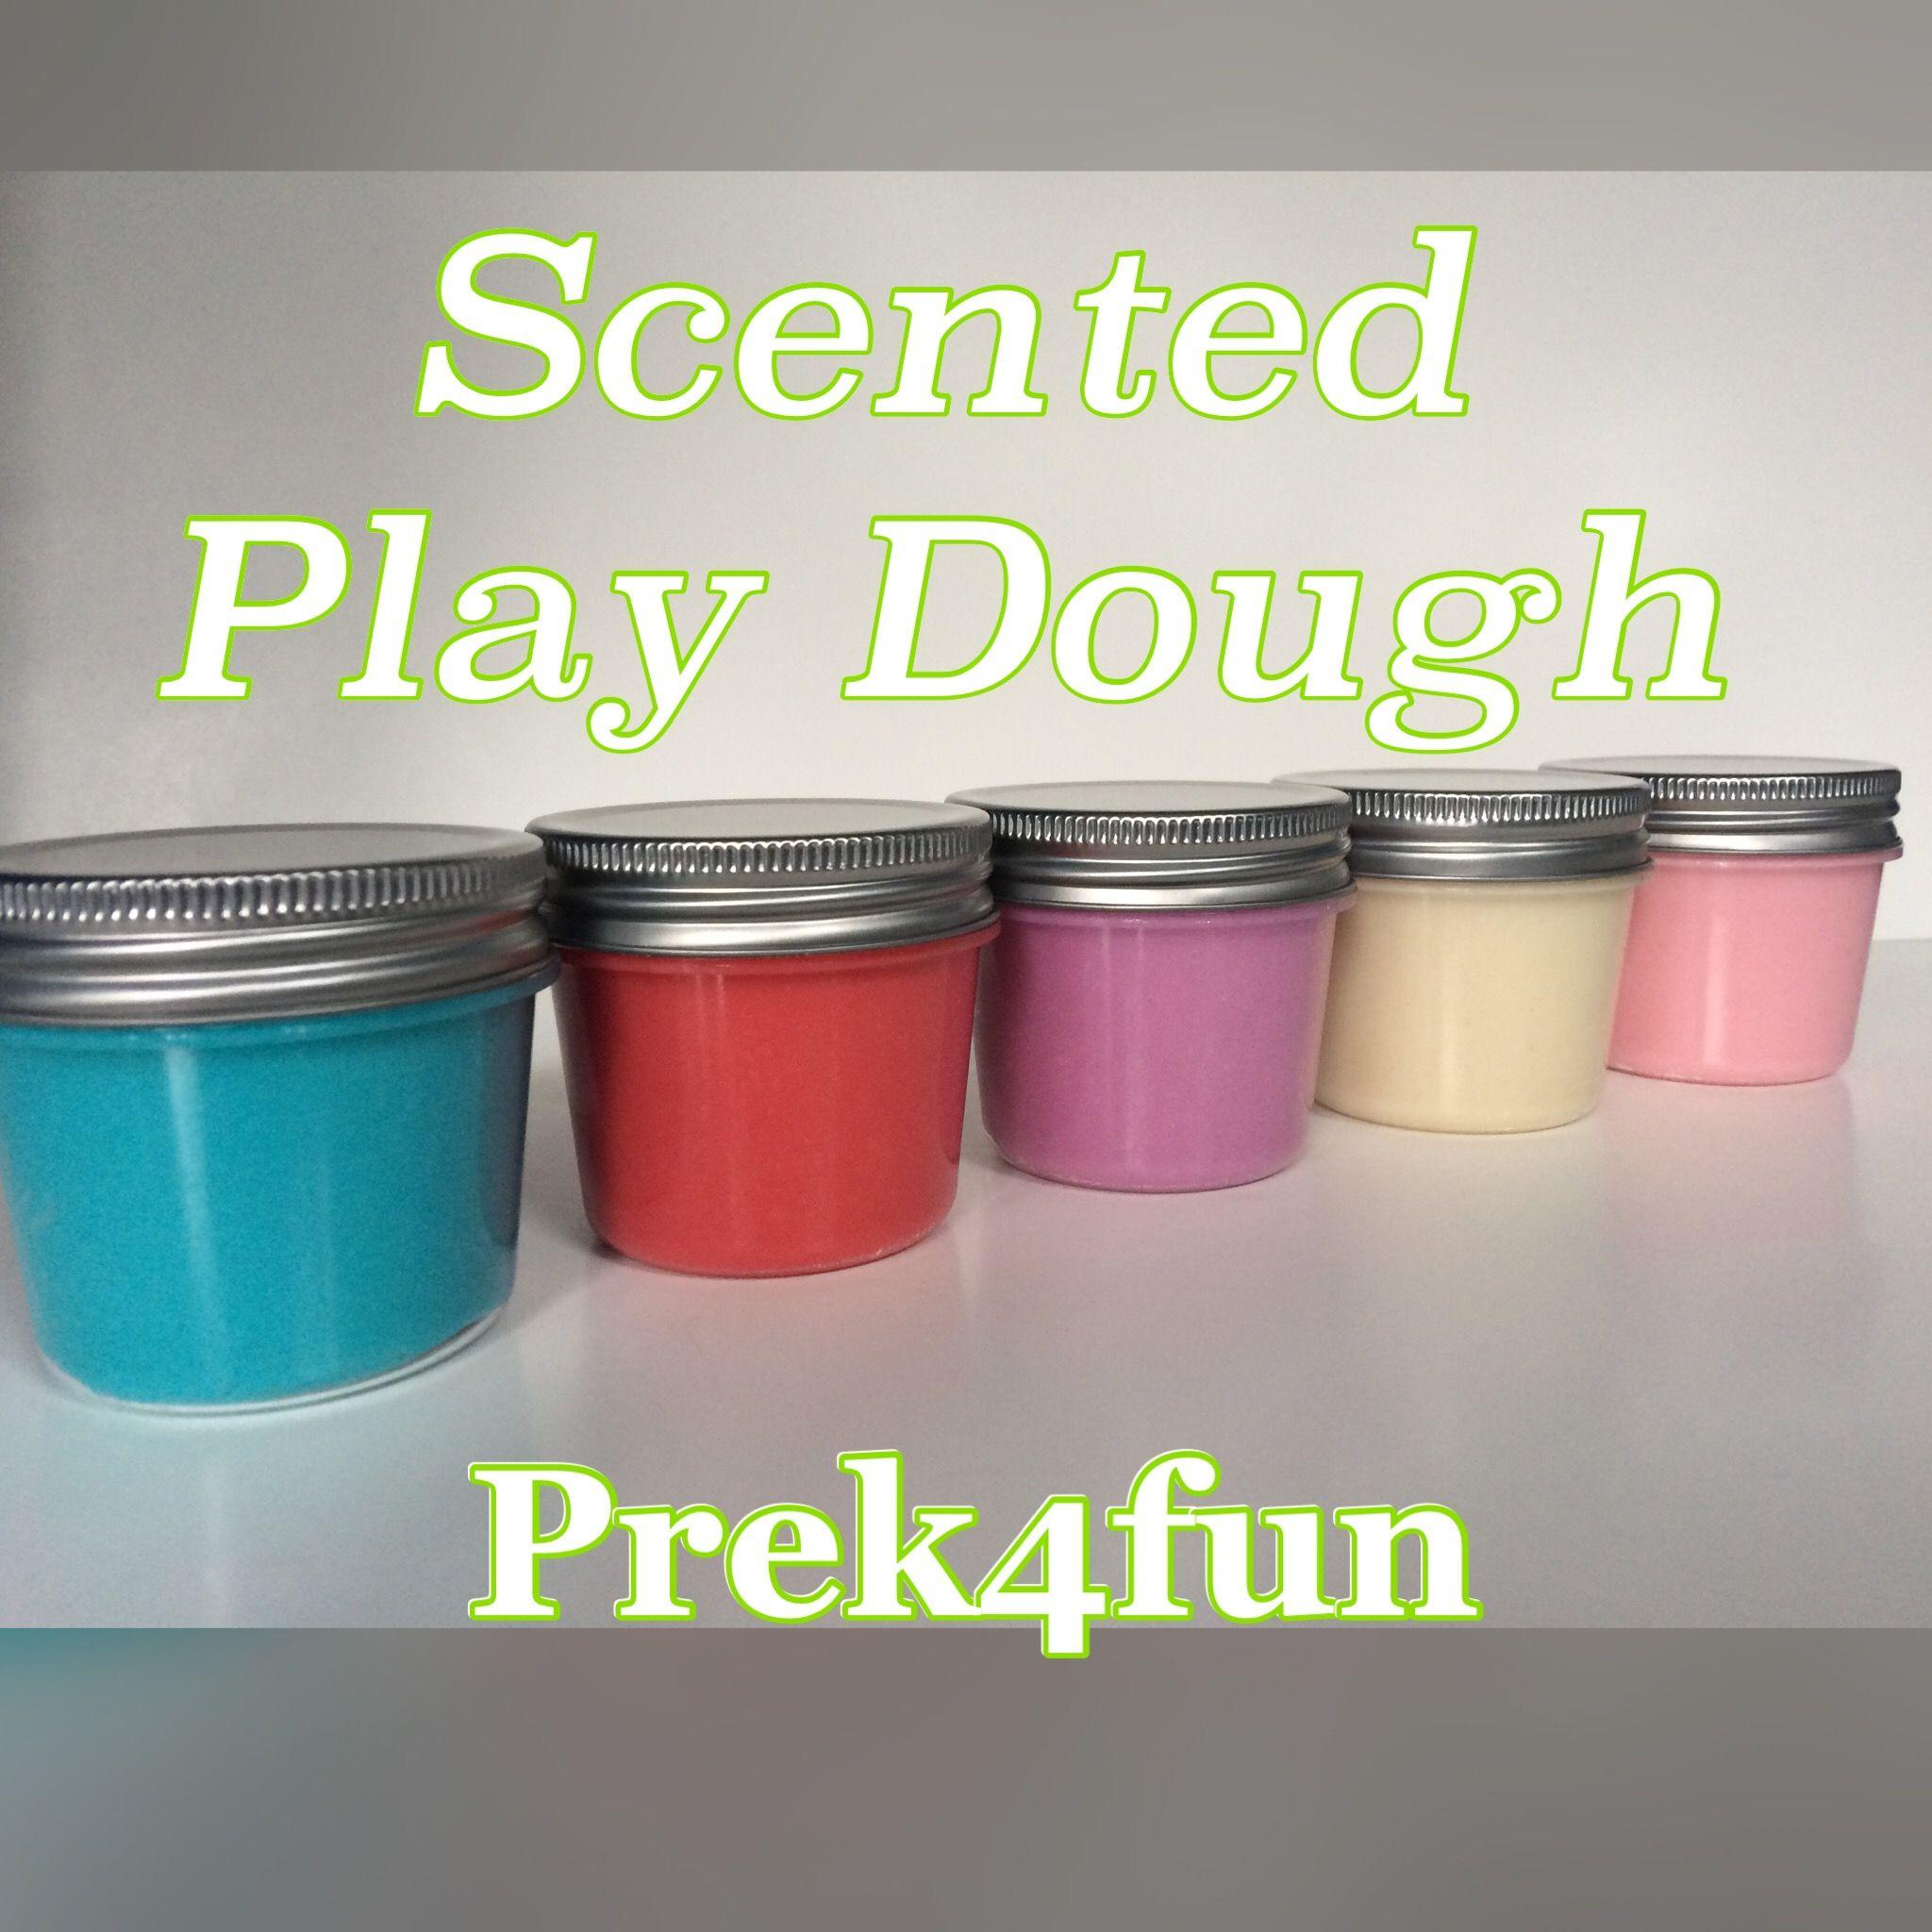 Pin By Prek4fun On Sensory Activities Preschool Prek4fun